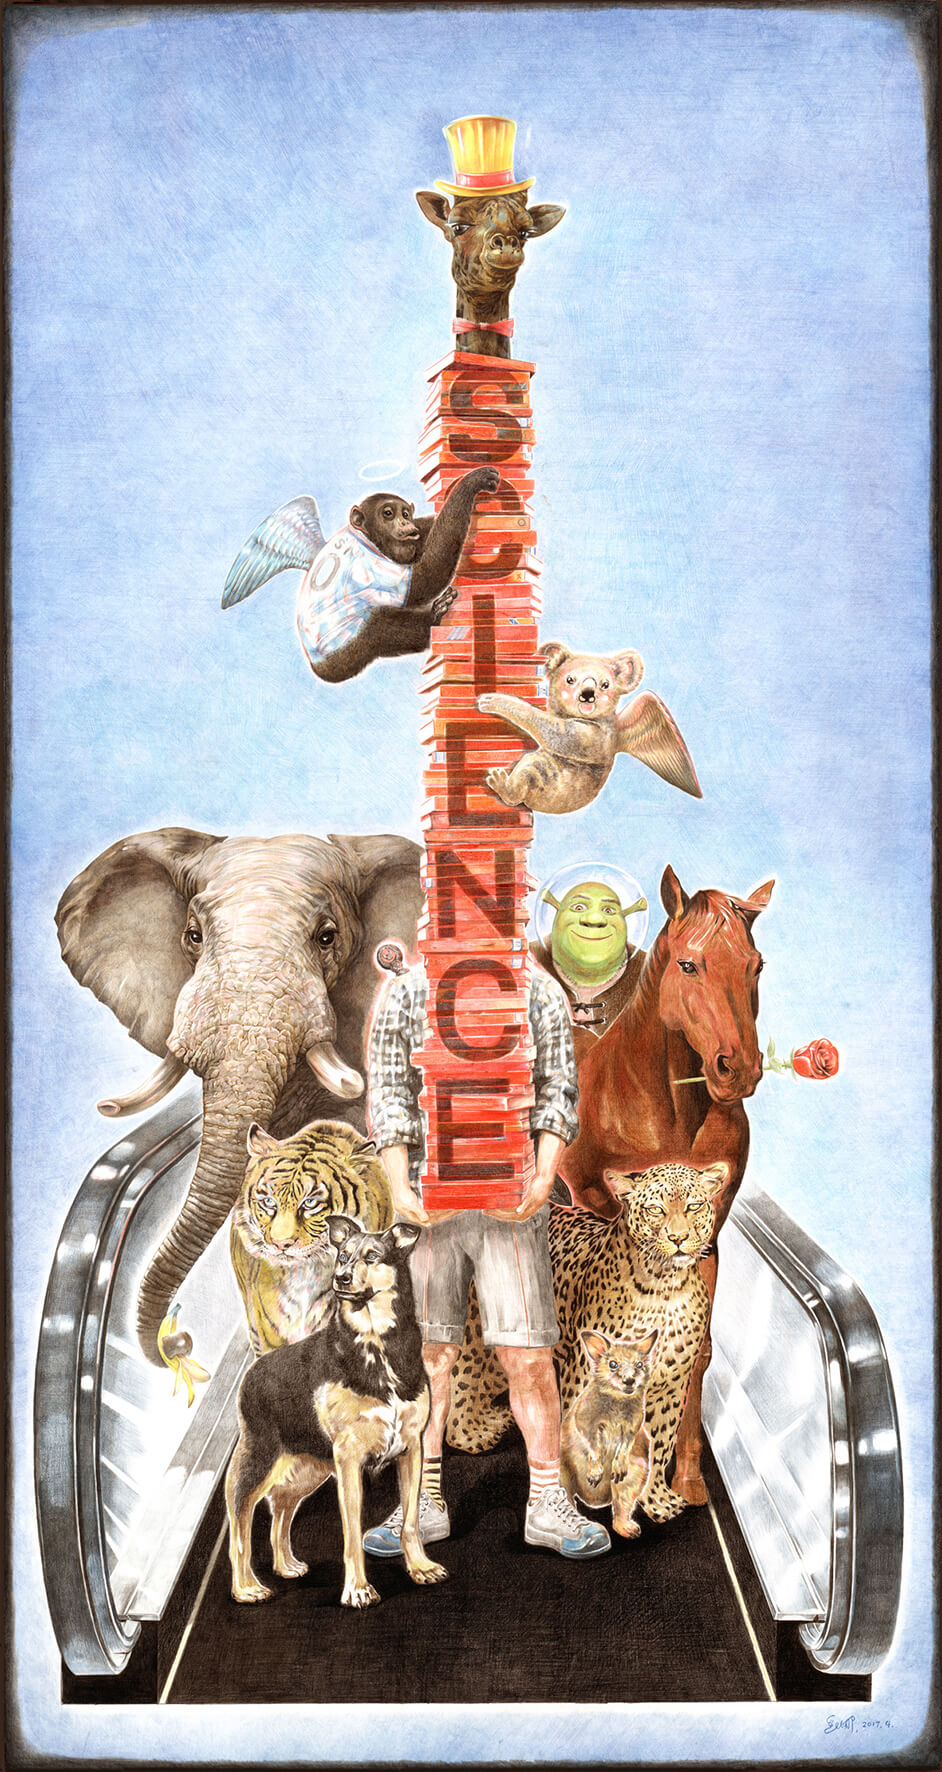 collage animales y shrek zhao na